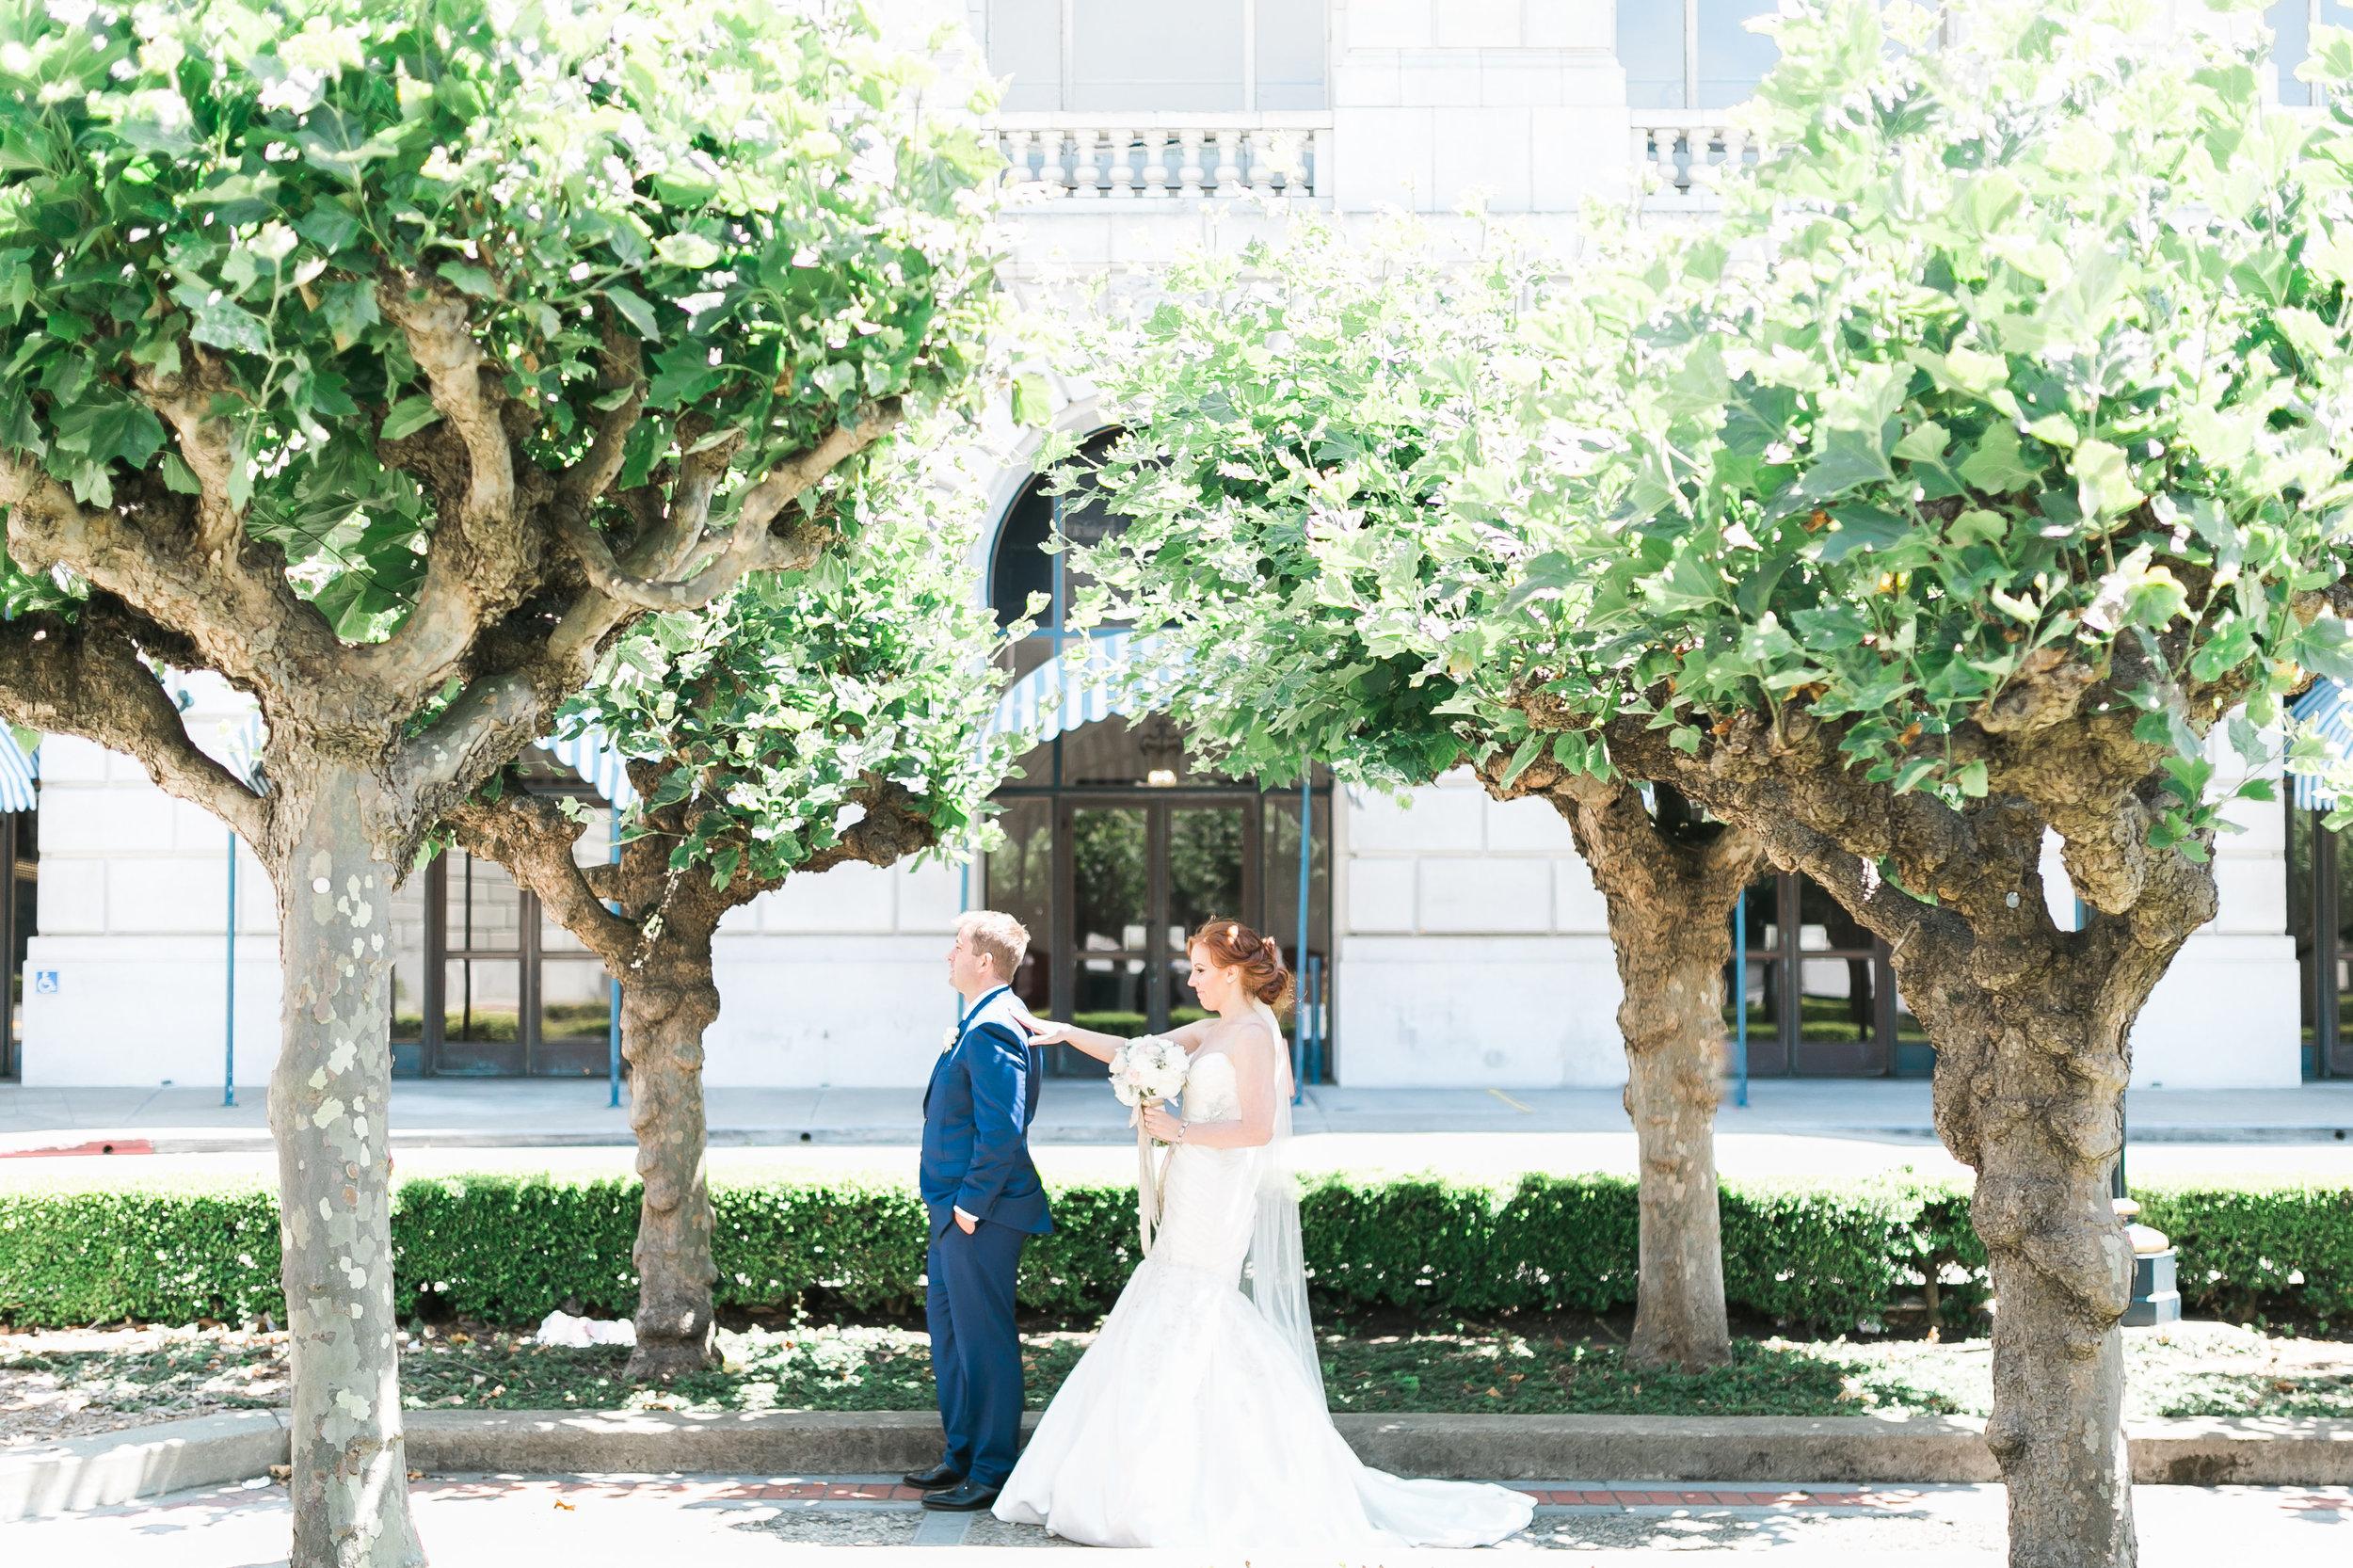 An Intimate San Francisco City Hall Wedding - J.Anne Photography -- Wedding Blog - The Overwhelmed Bride